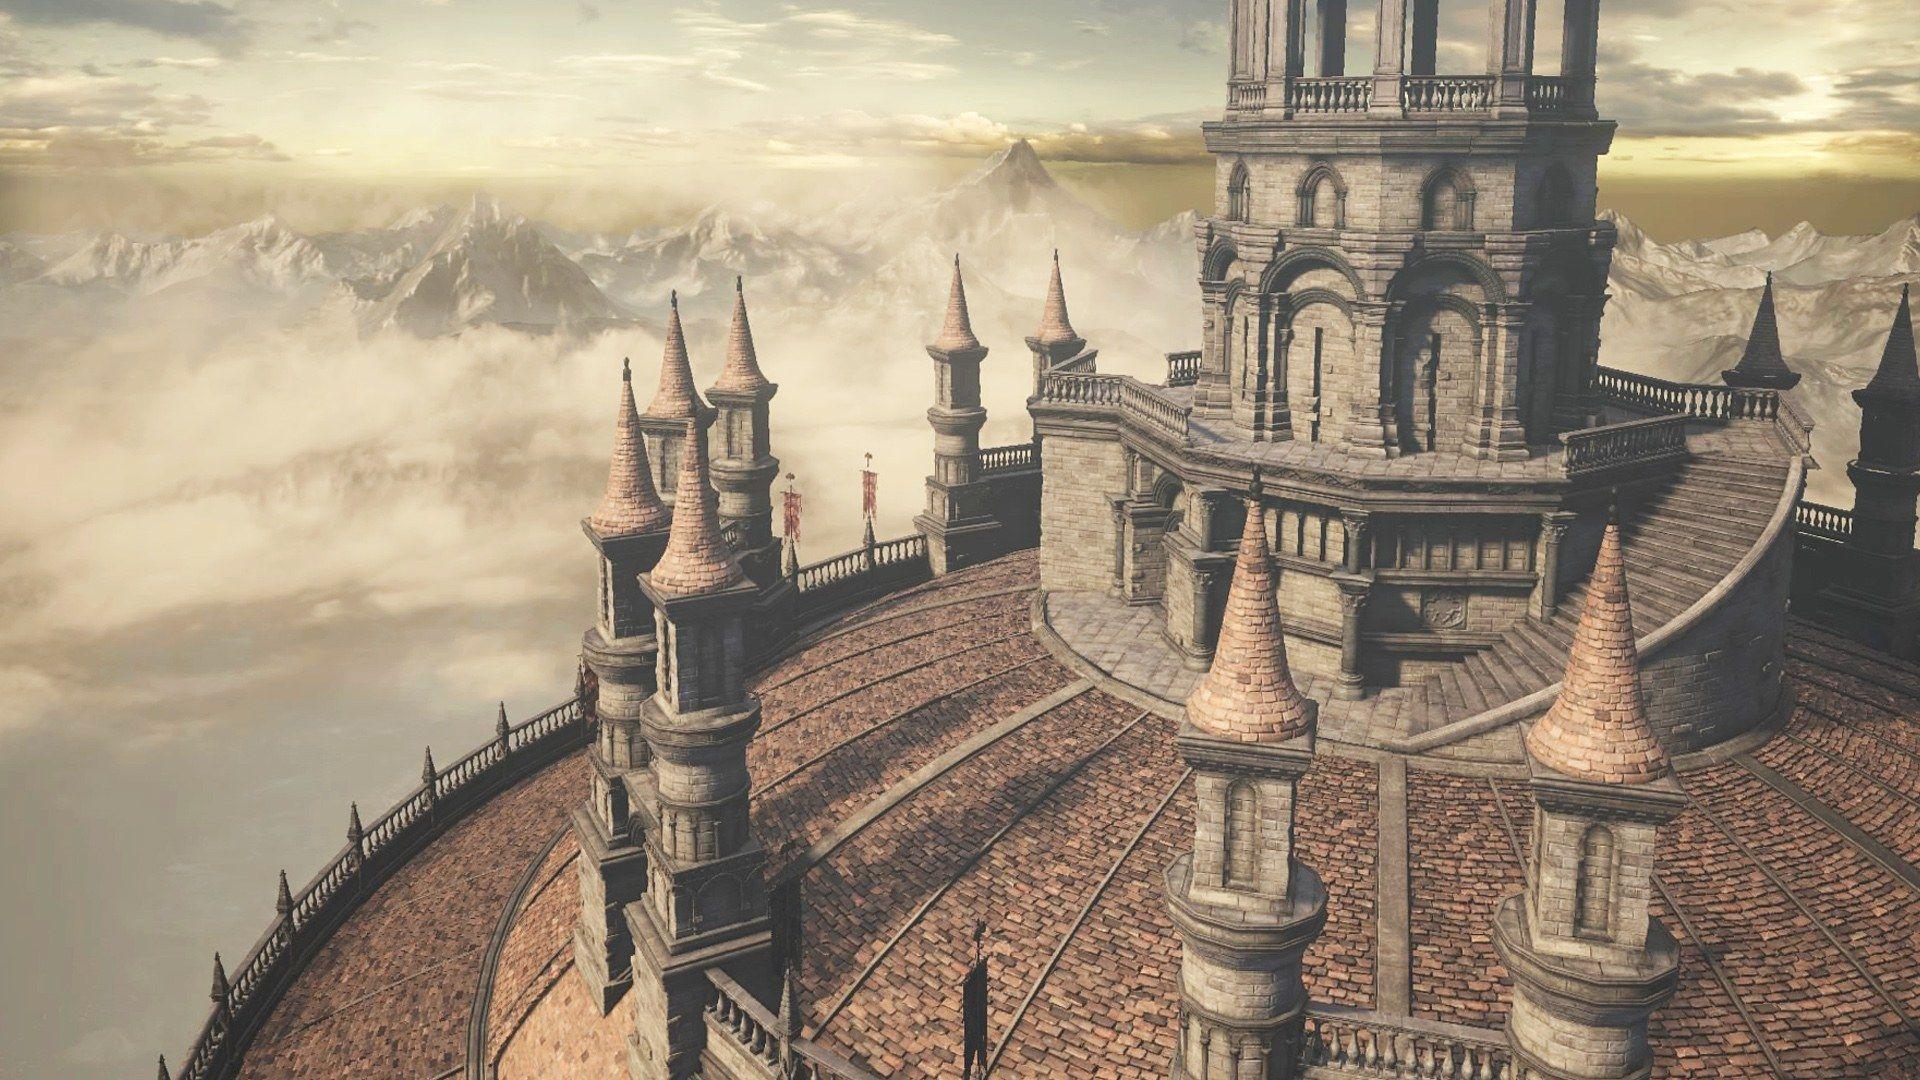 Dark Souls Map Wallpapers - Top Free Dark Souls Map Backgrounds